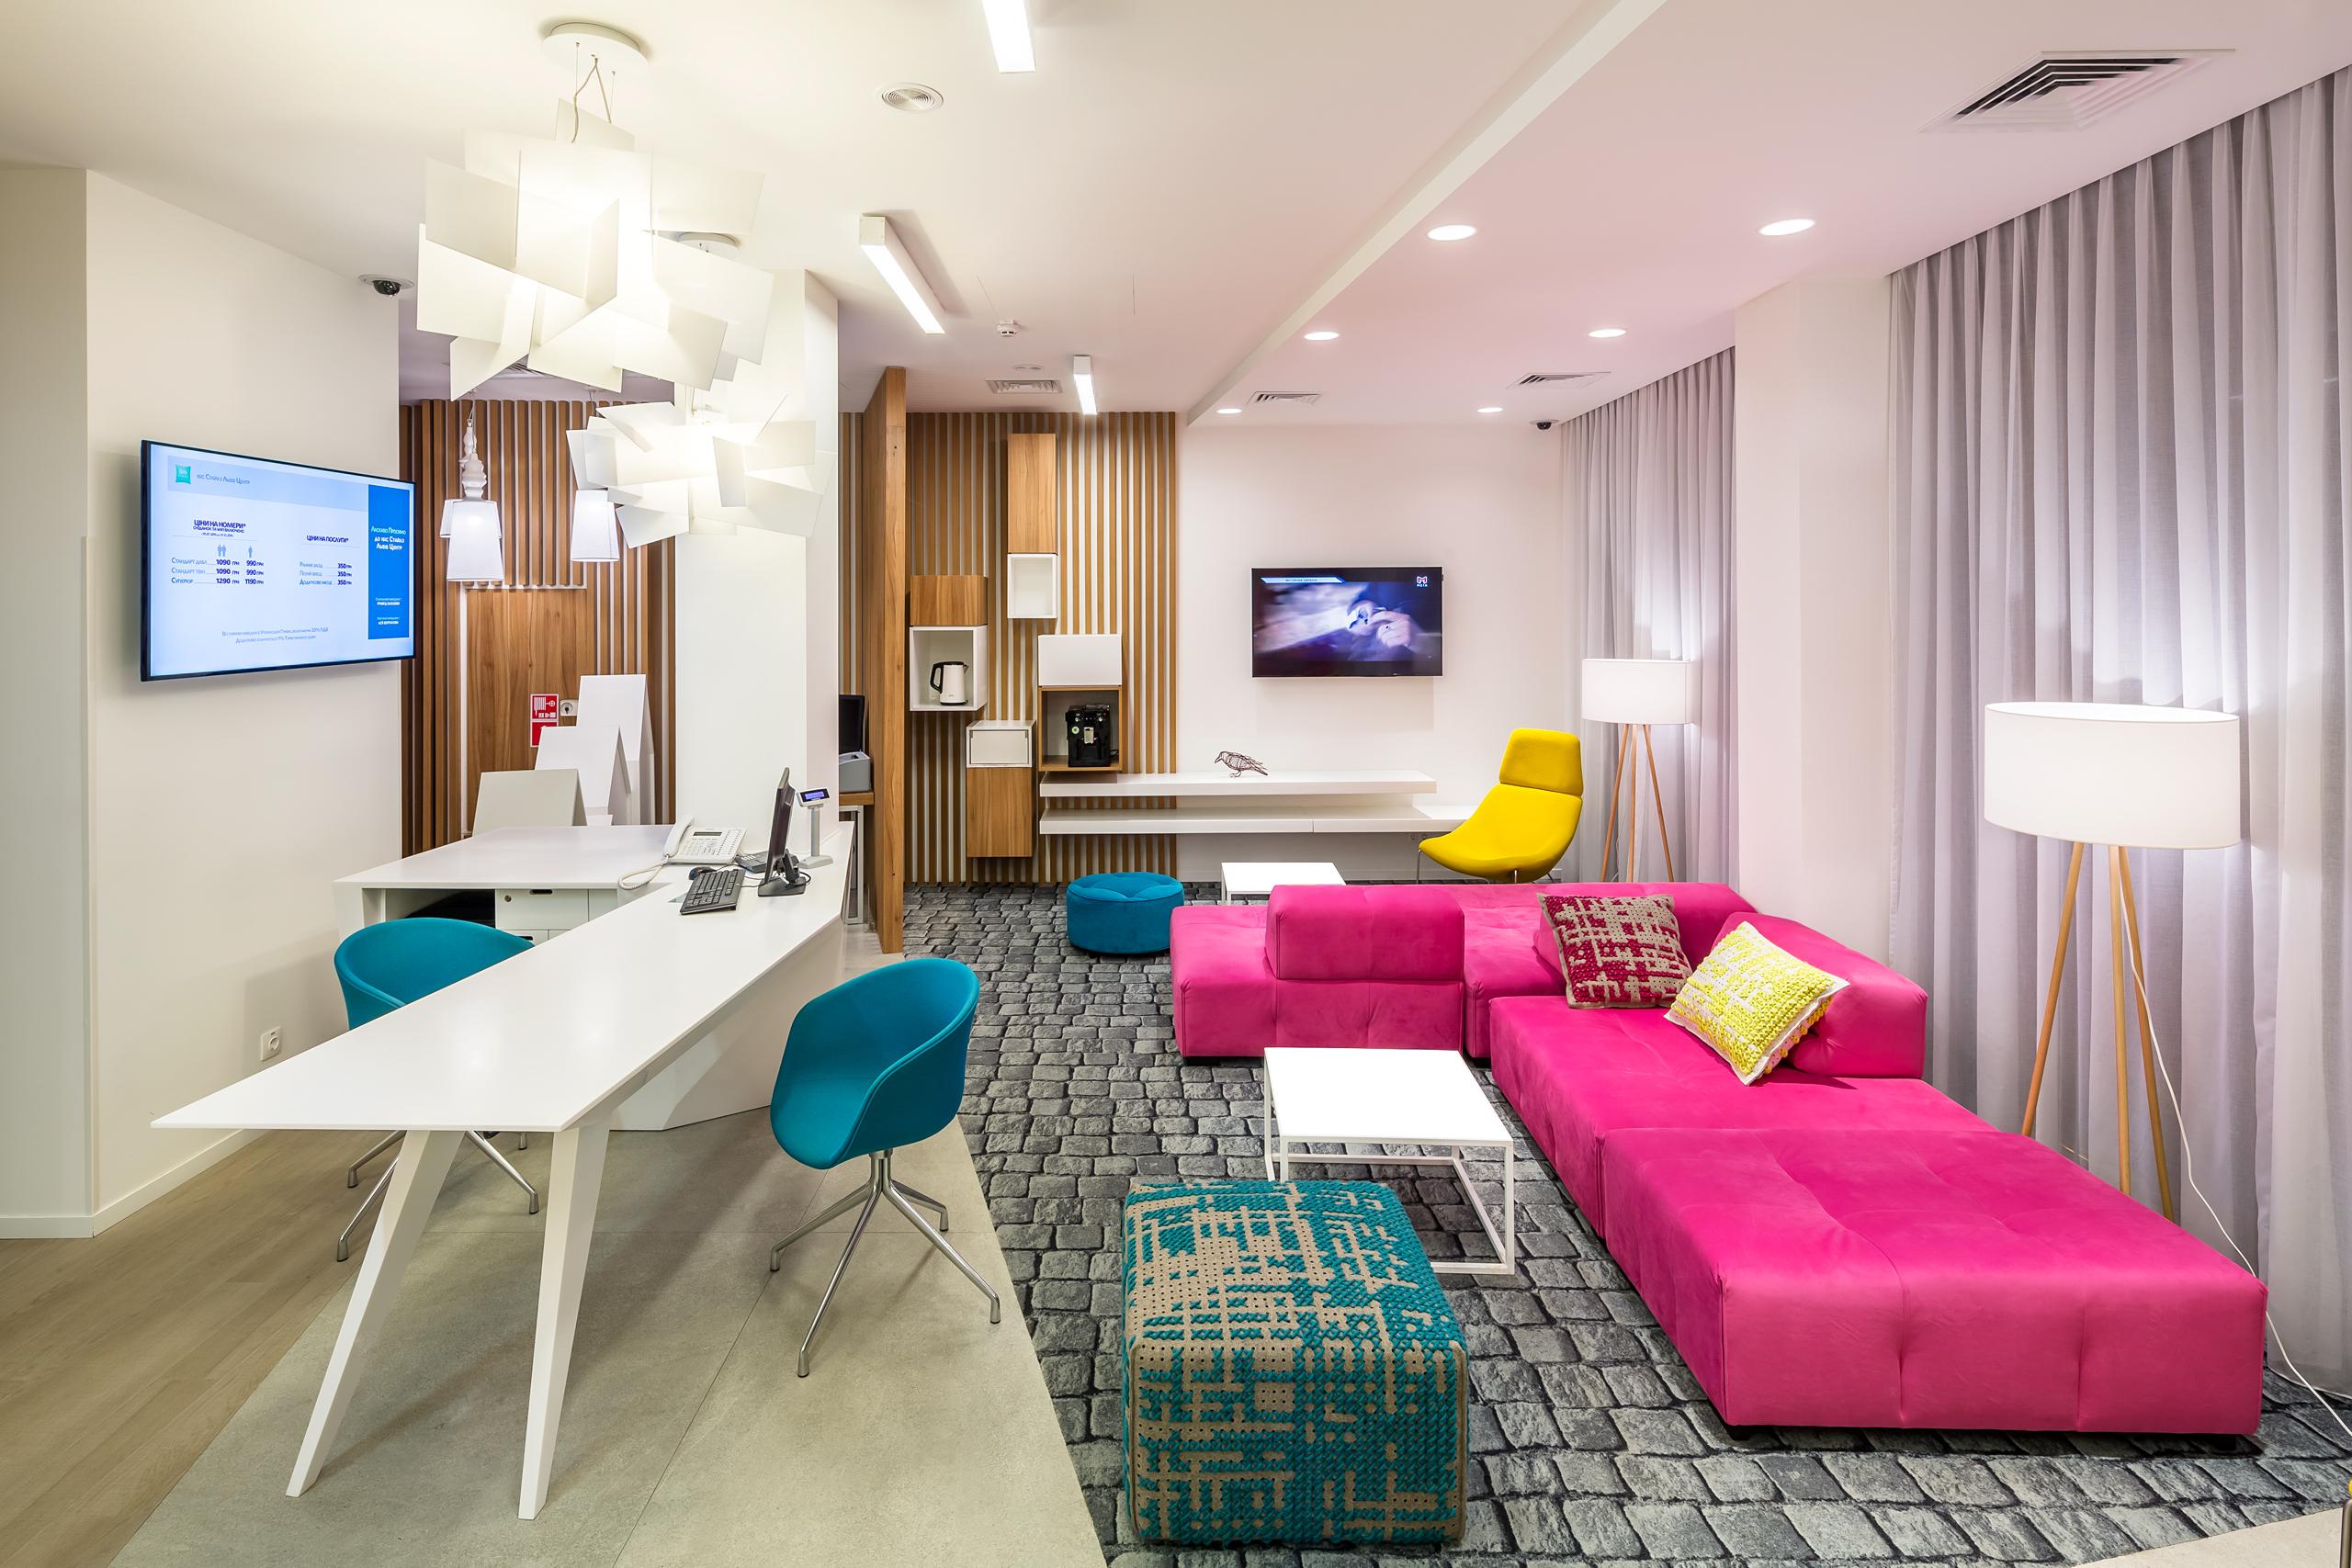 Ibis styles hotel ec 5 architects lviv ukraine for Architects and interior designers